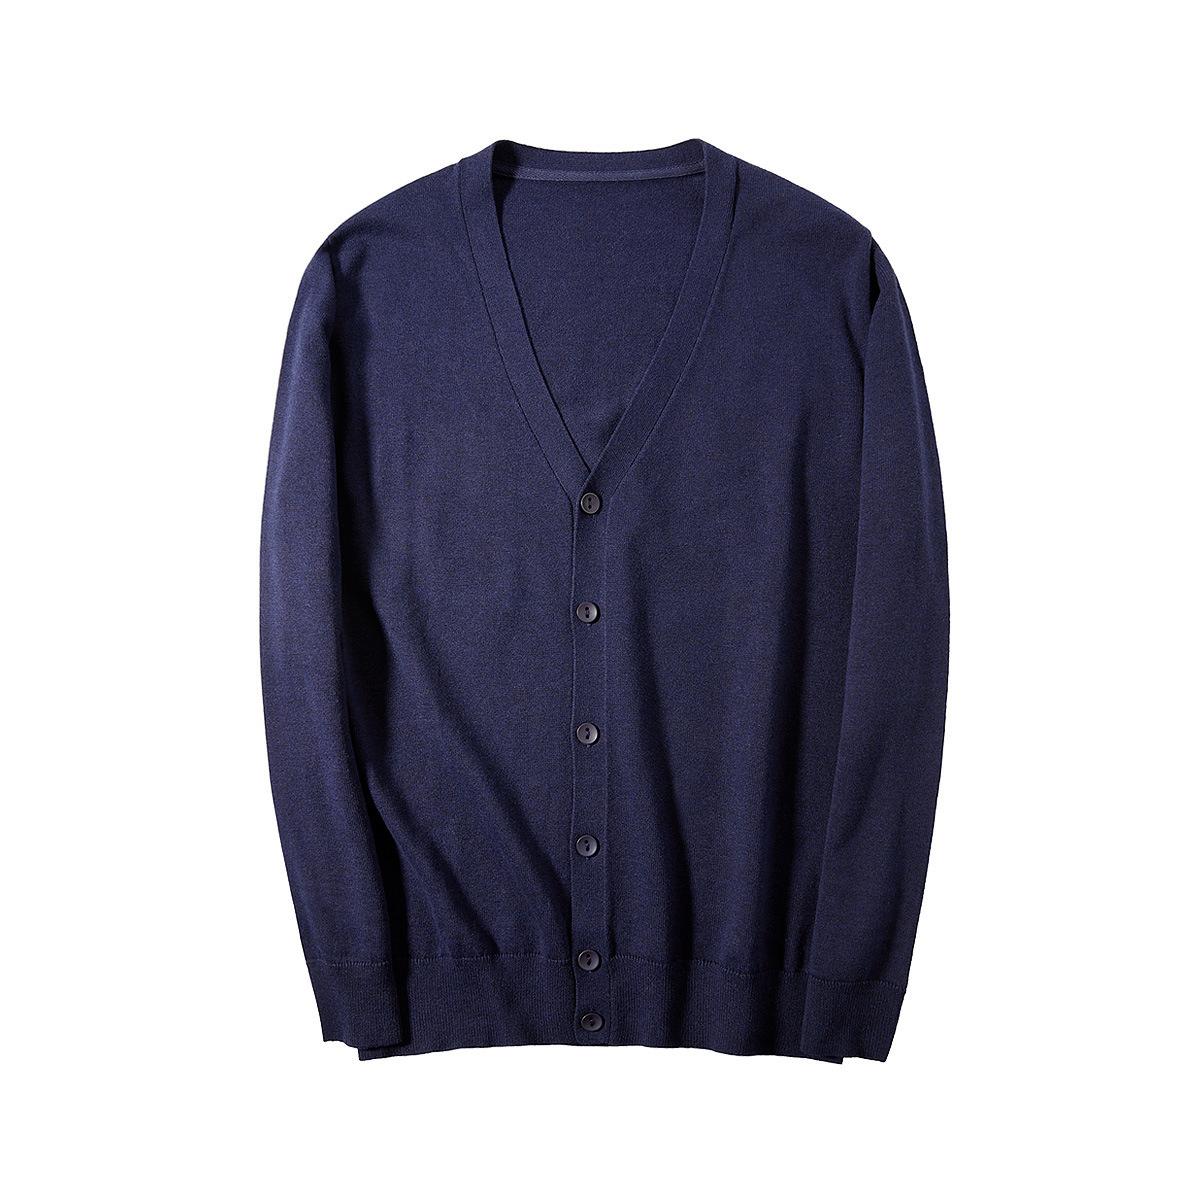 Mens autumn t-shirt mens sweater multi color optional mens knitting button solid color cardigan Blum spun V-neck